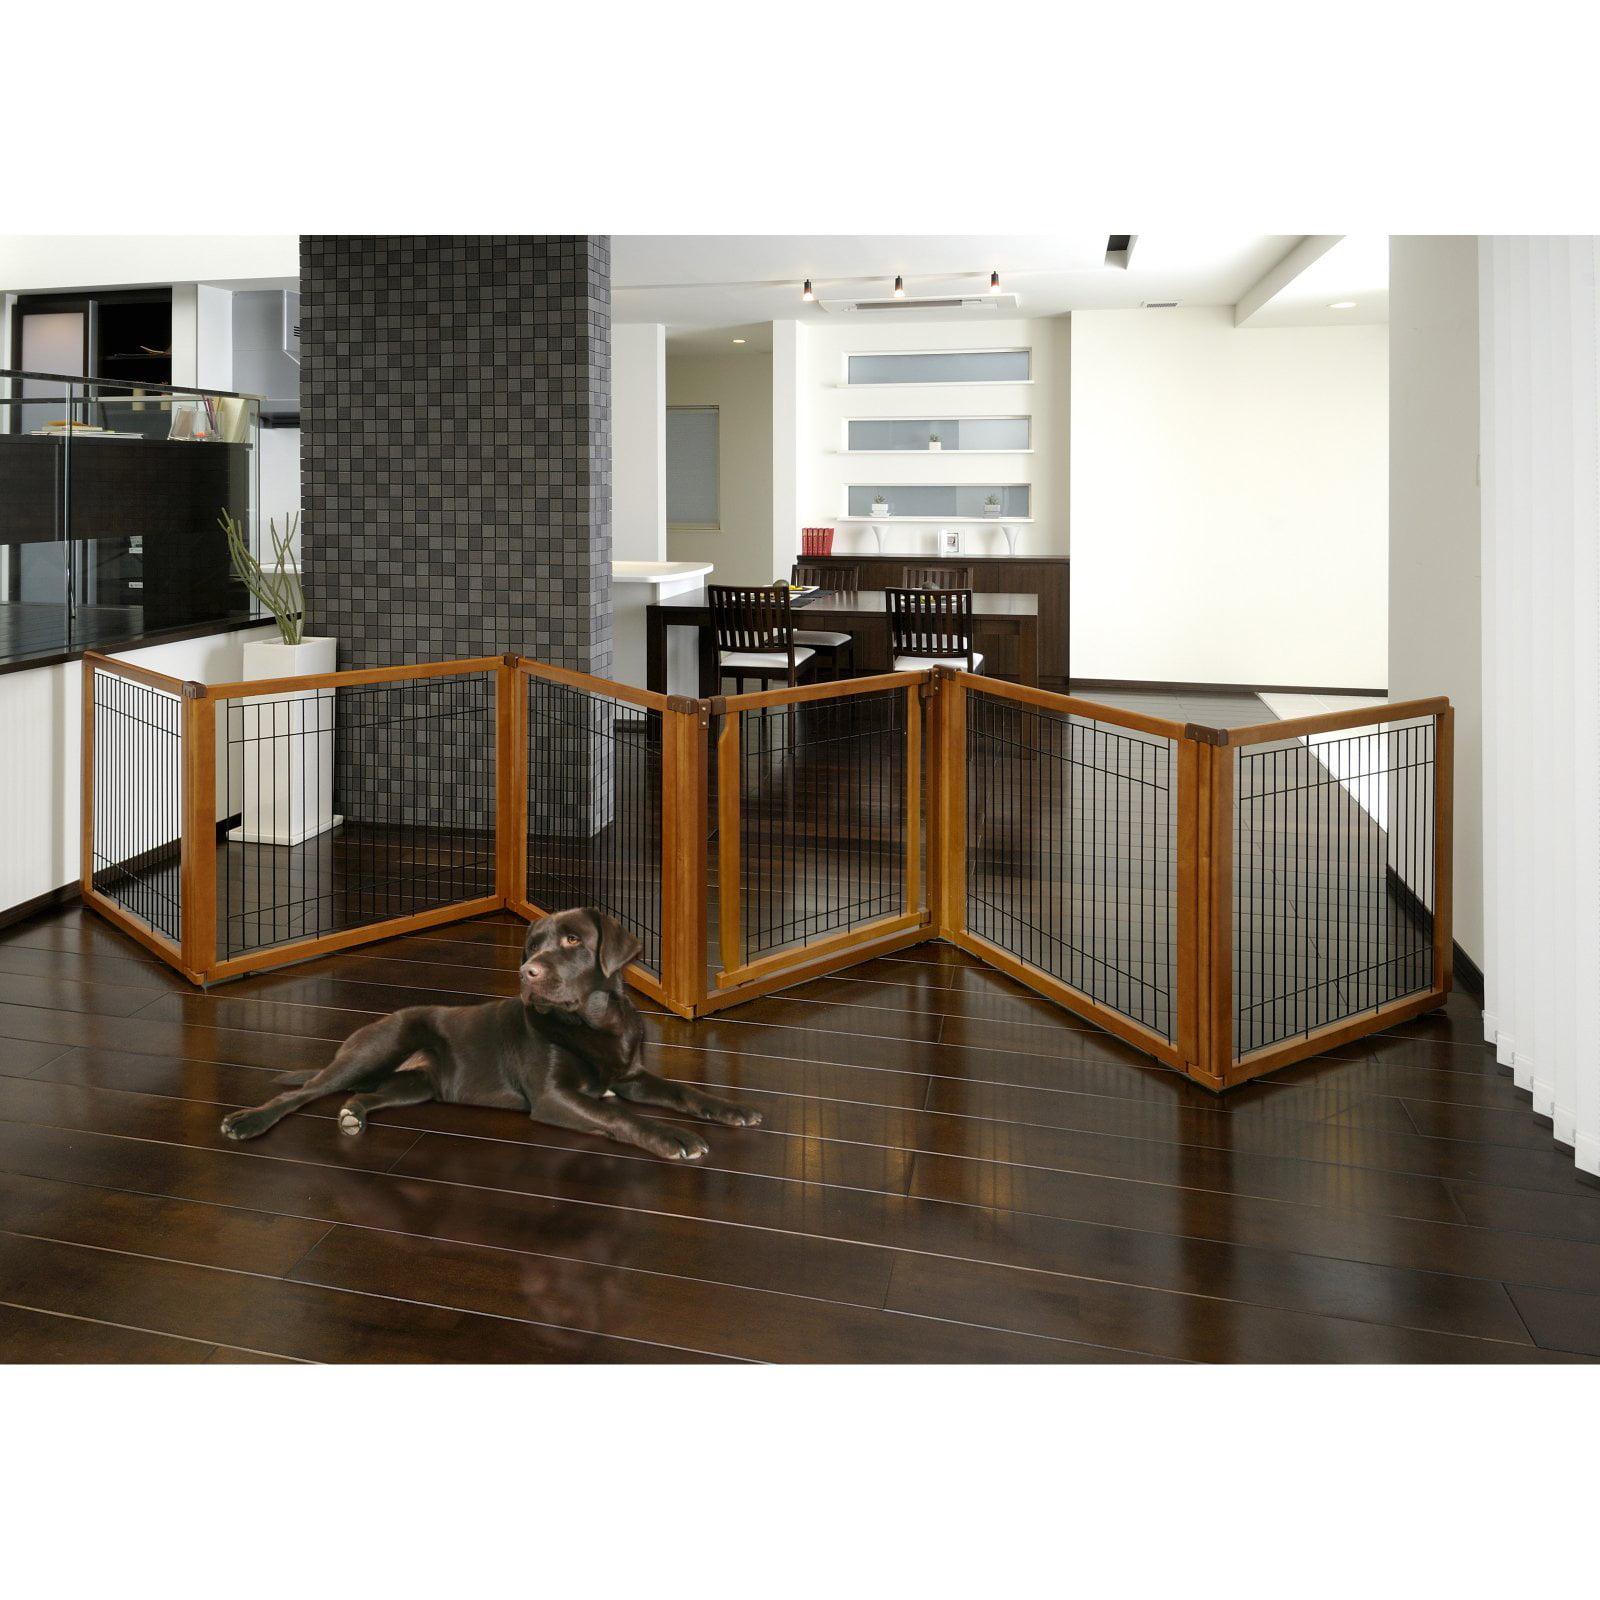 Richell USA Convertible Elite 6 Panel Pet Gate